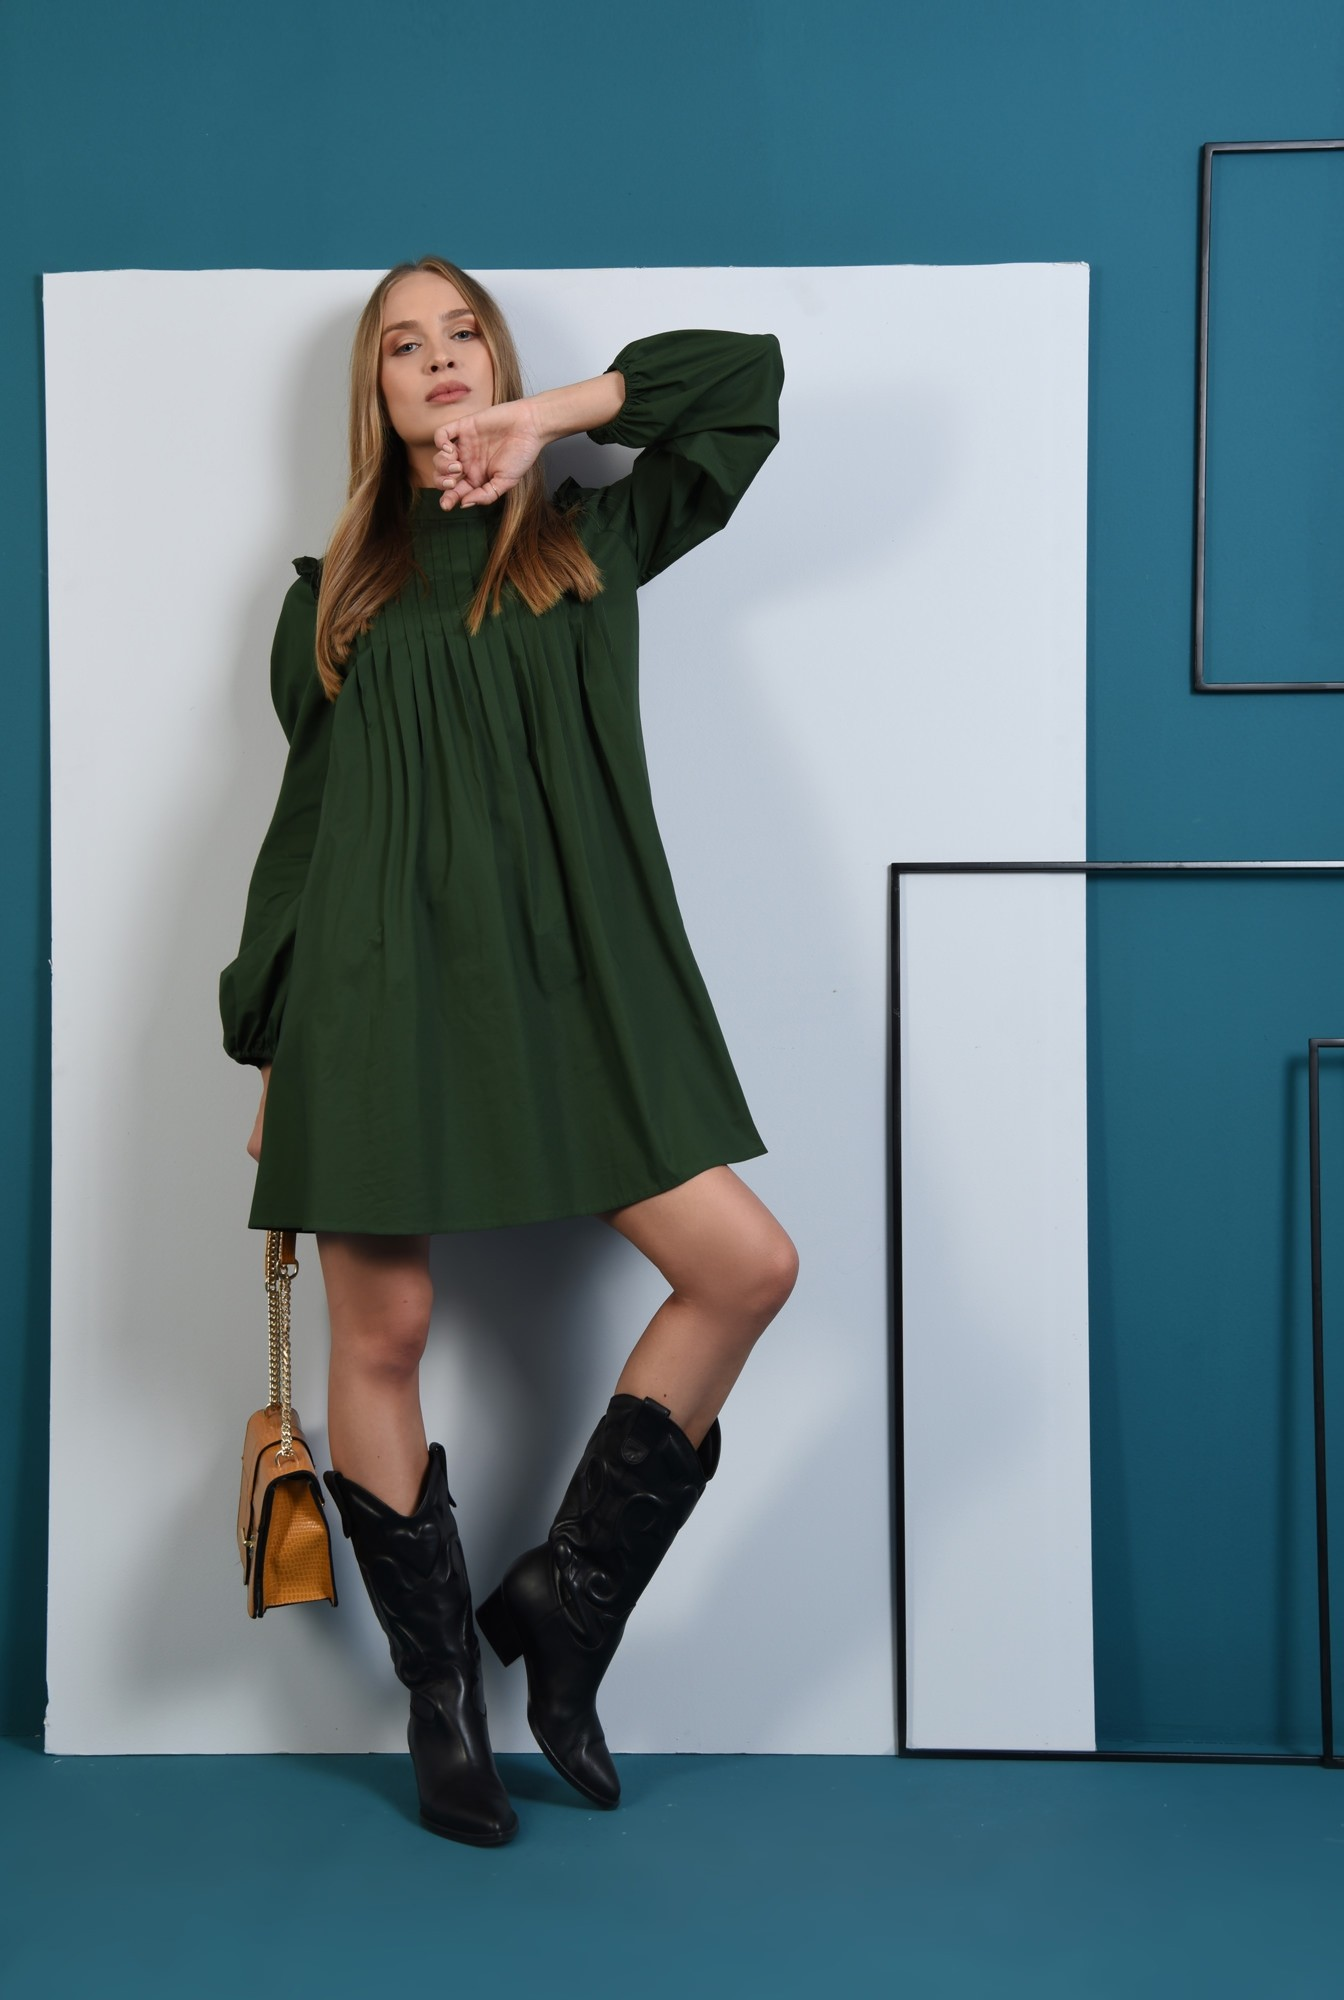 0 - 360 - rochie verde, din bumbac, cu pliuri decorative, maneci bufante